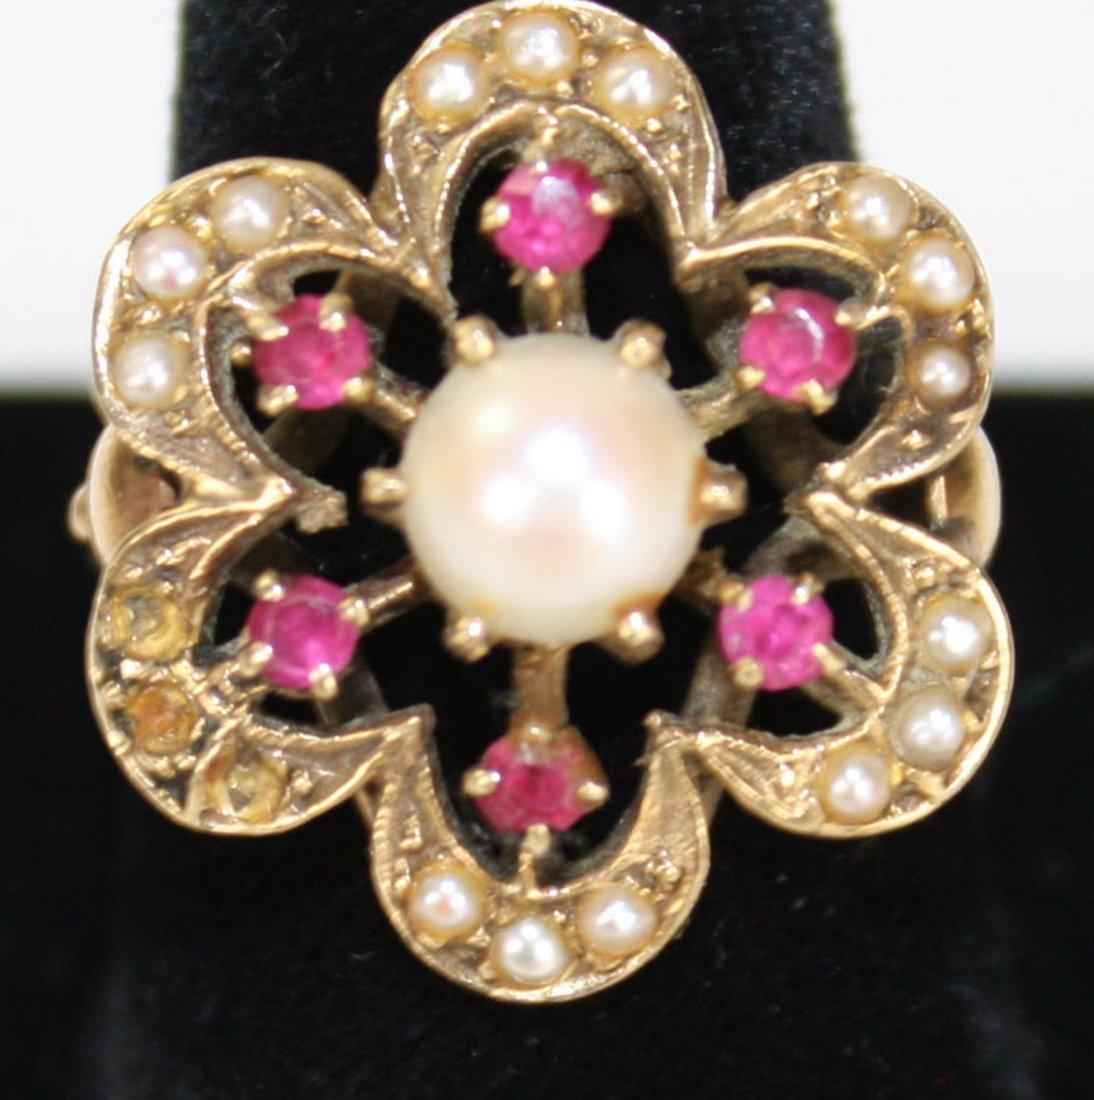 14k y.g. floral form ladies ring having center 7mm